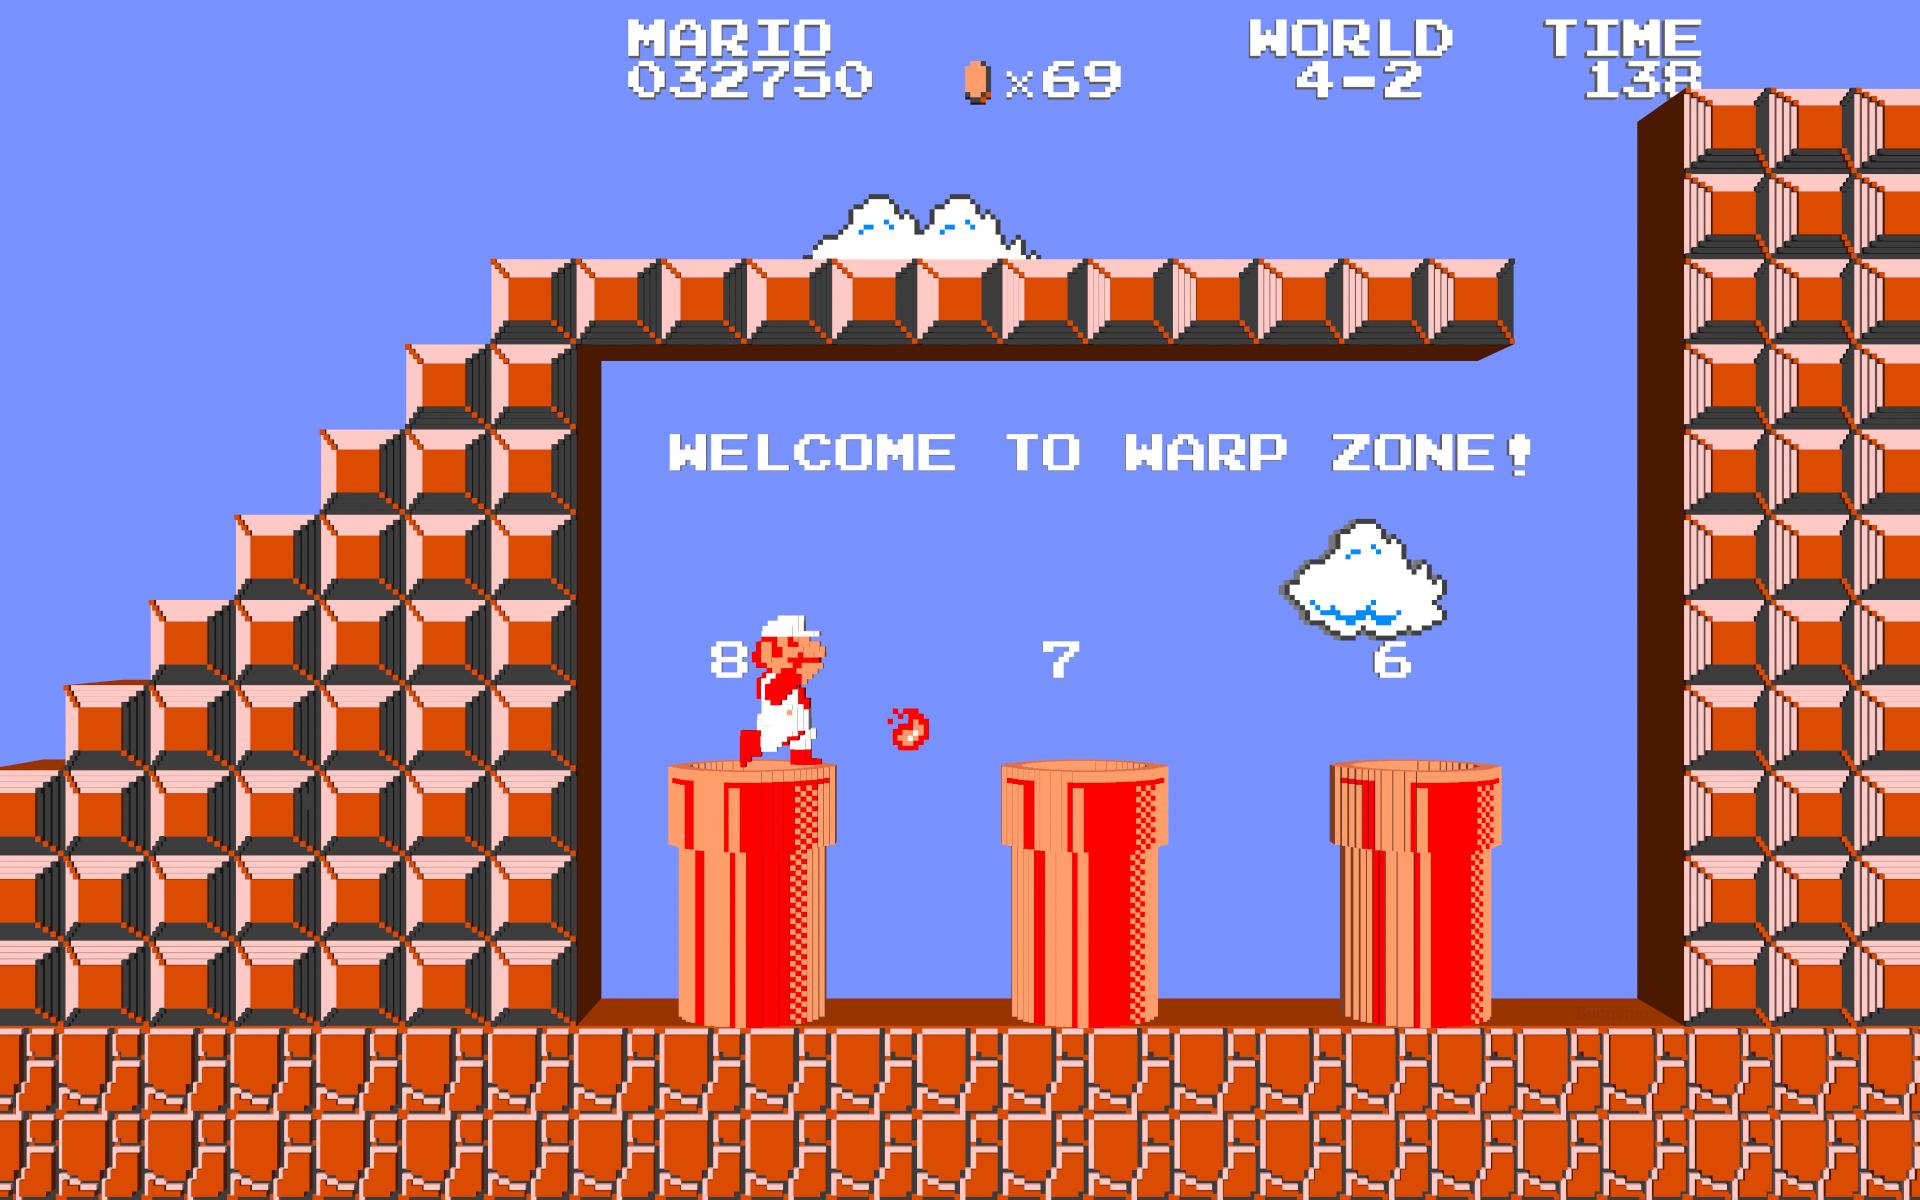 Little Goomba From The Original Nintendo Video Game Super Mario